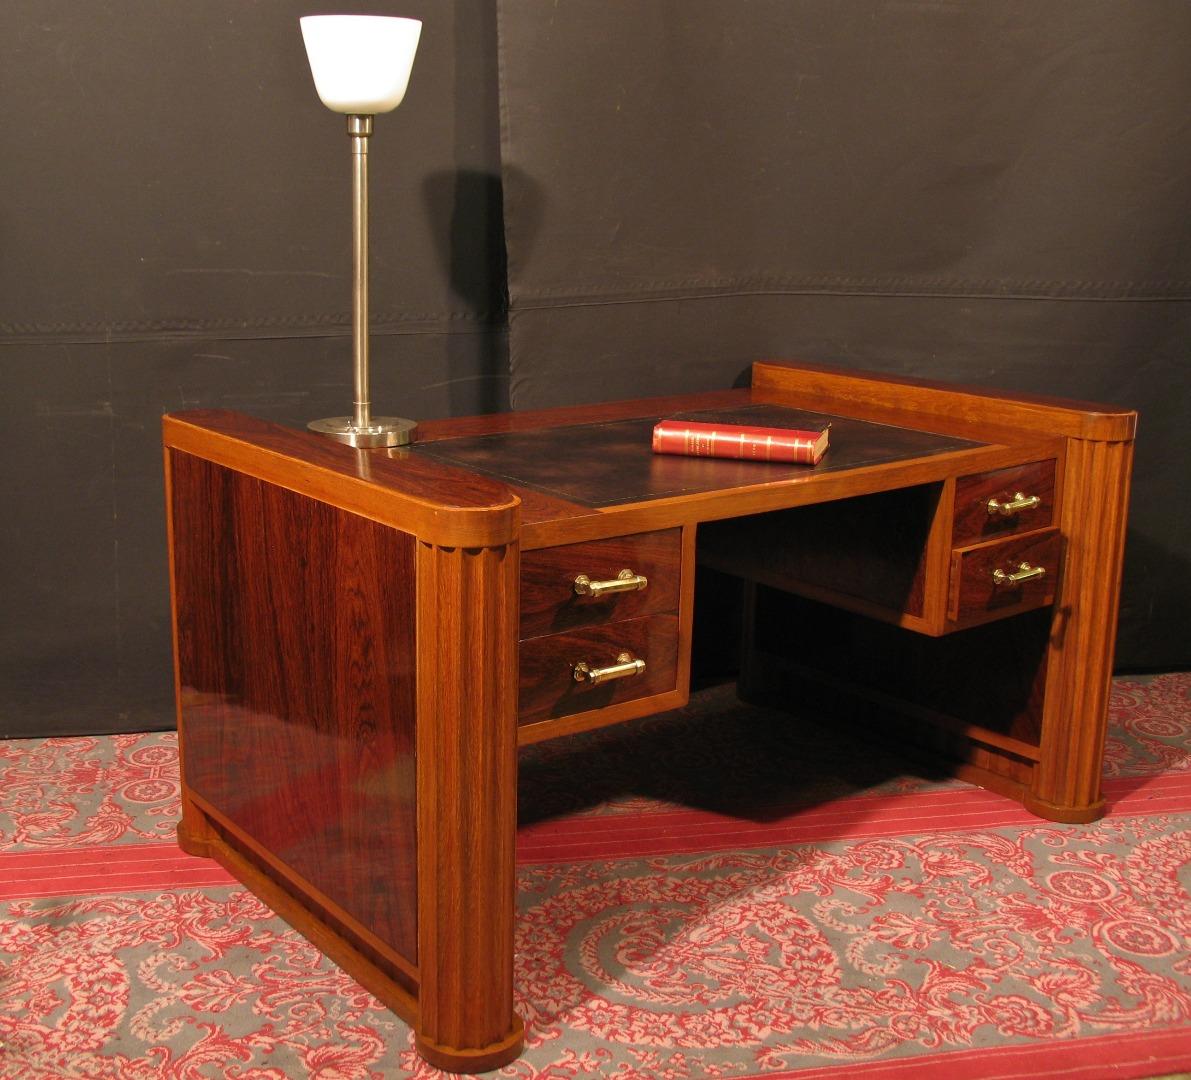 bureau plat art deco 1930 1940 en palissandre et teck design 4 tiroirs 71 5000 office flat art deco 1930 1940 rosewood and teak design 4 drawers